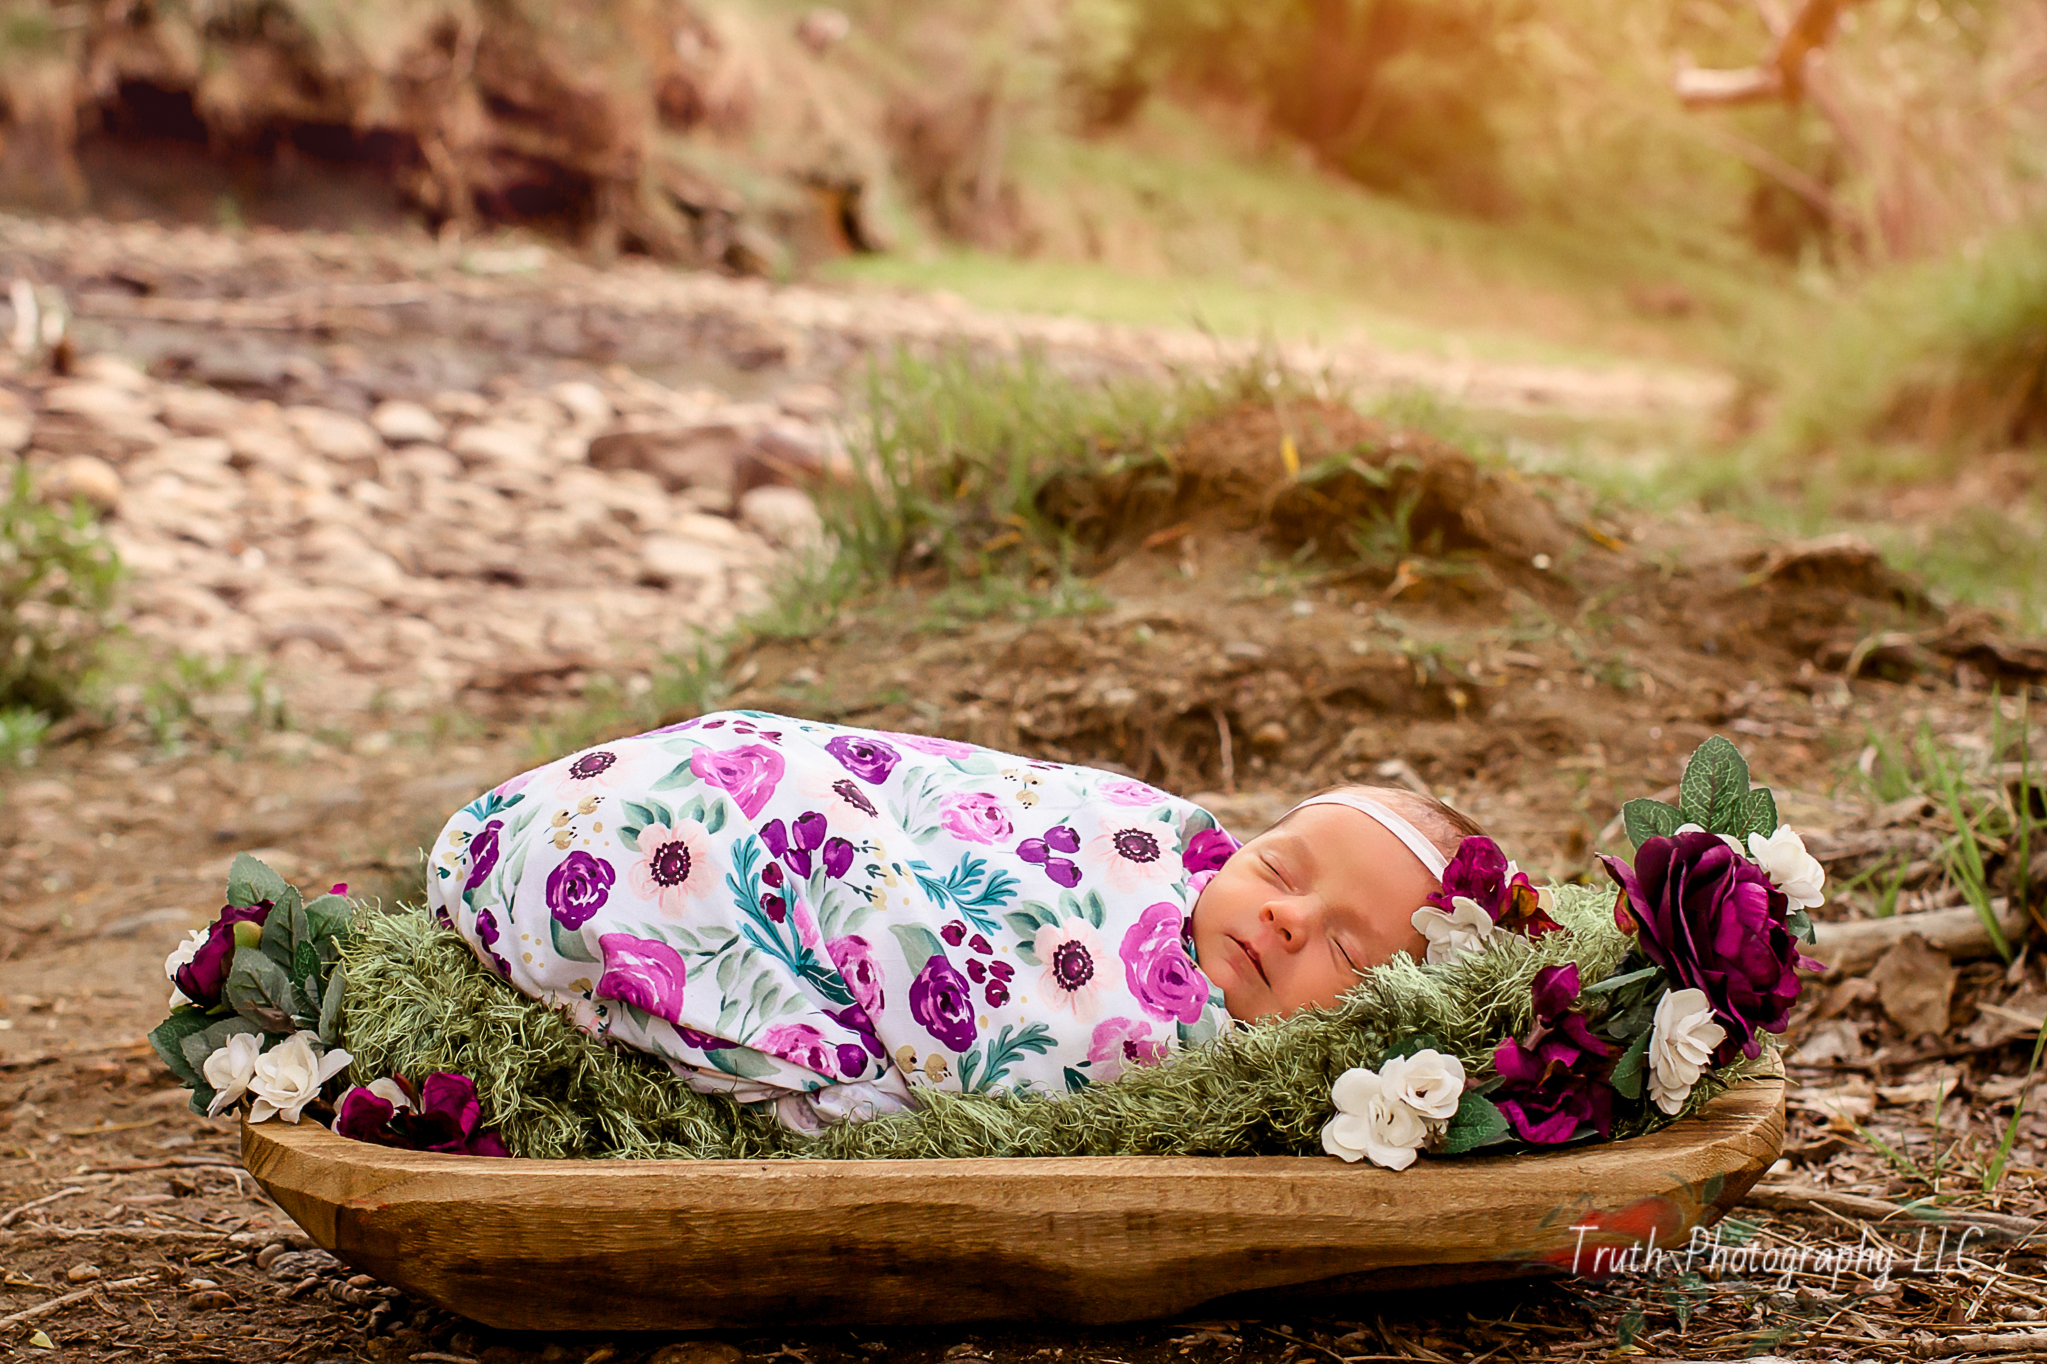 Truth-Photography-Denver-Outdoor-newborn-photos.jpg